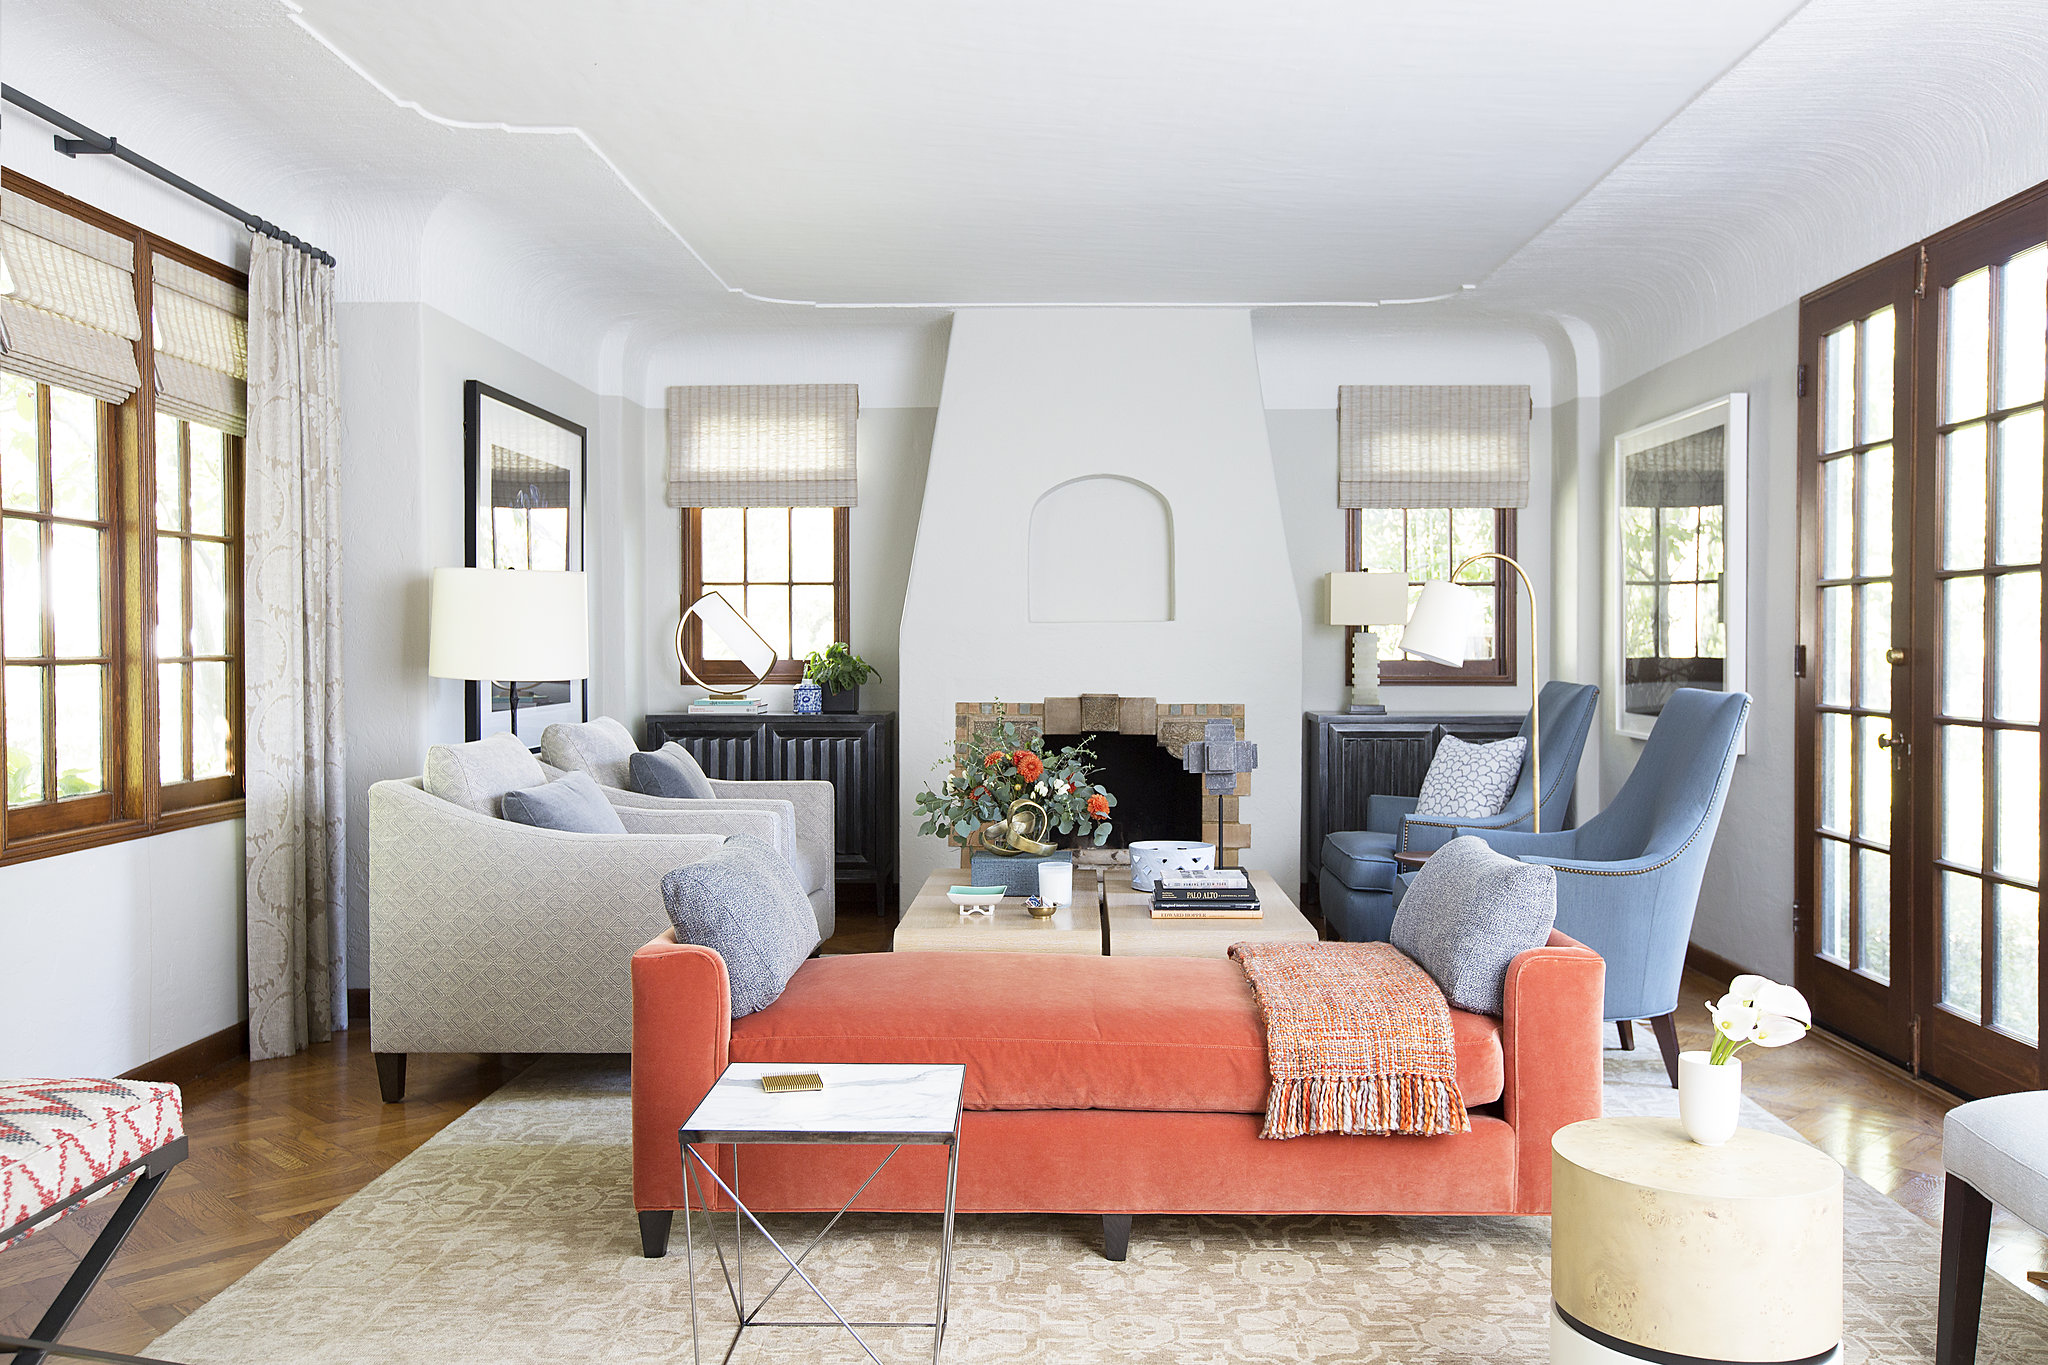 1920s Palo Alto Tudor, Living Room by Melinda Mandell Interior Design